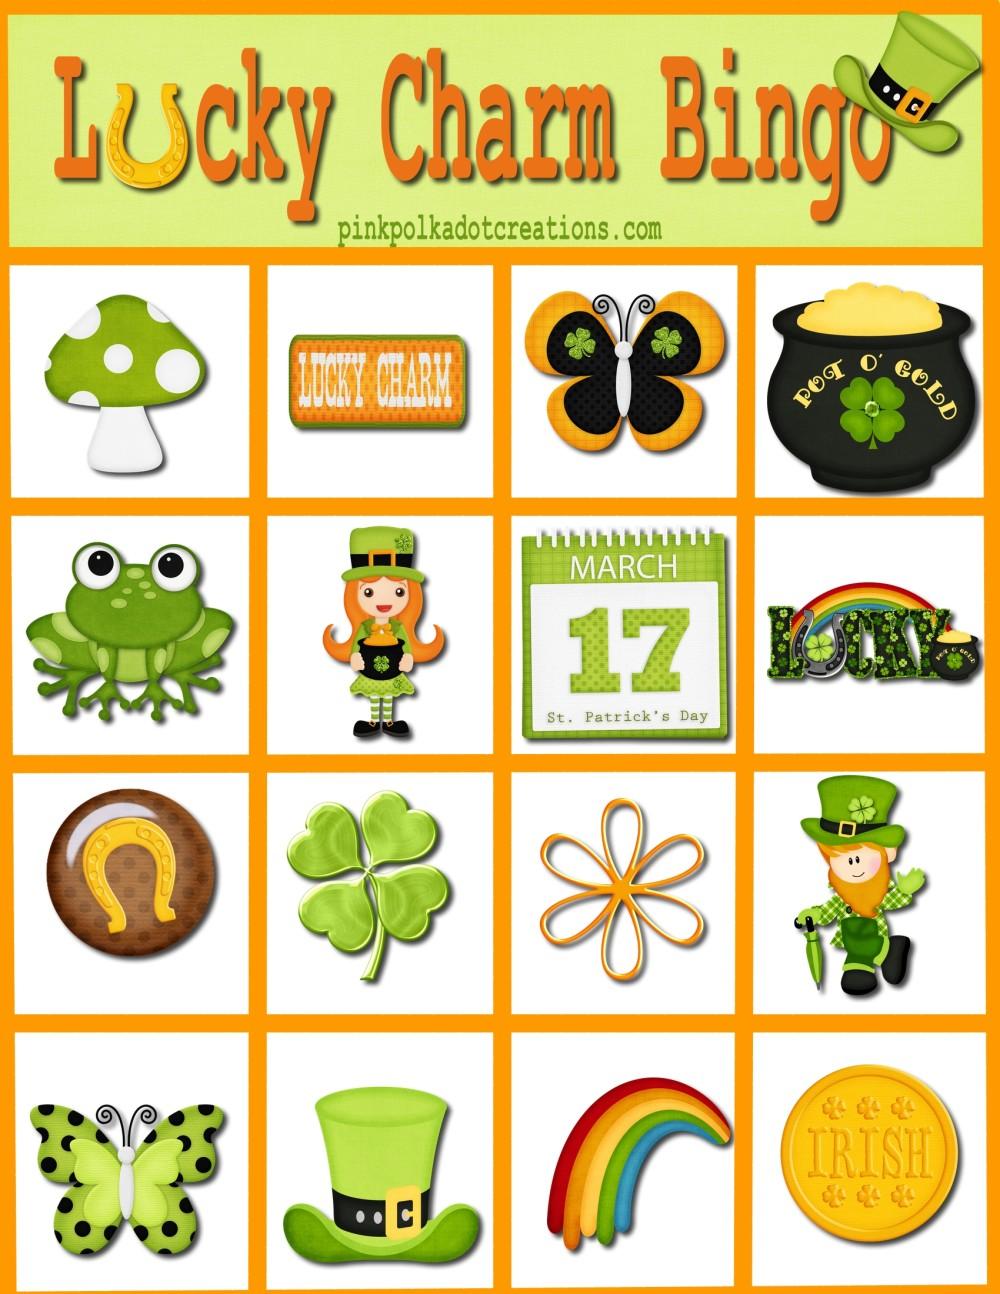 bingo lucky charms